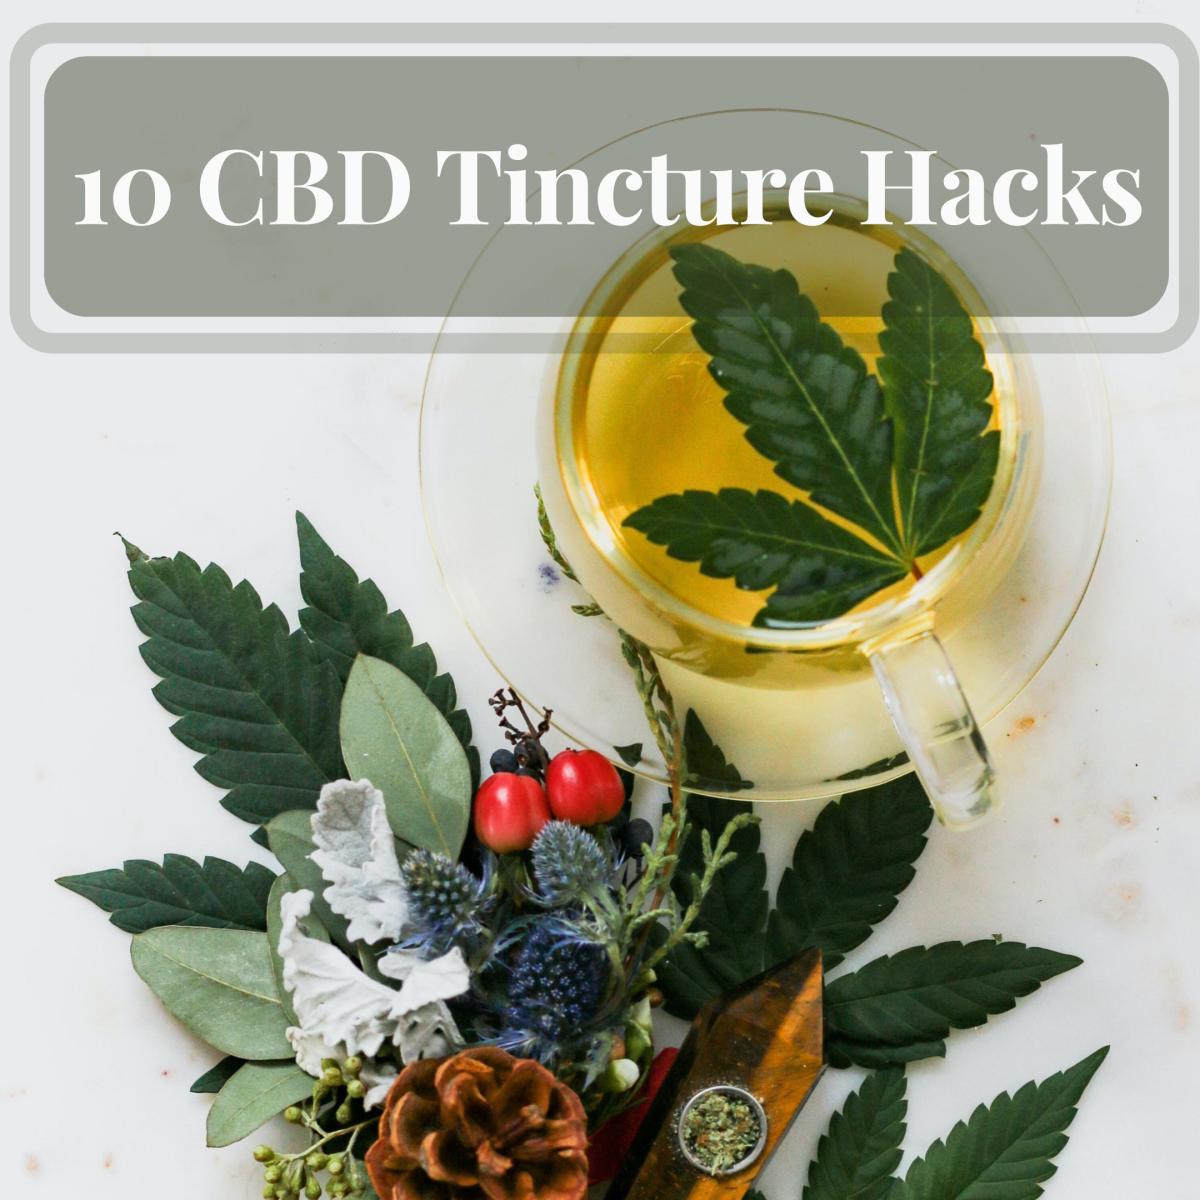 10 CBD Tincture Hacks